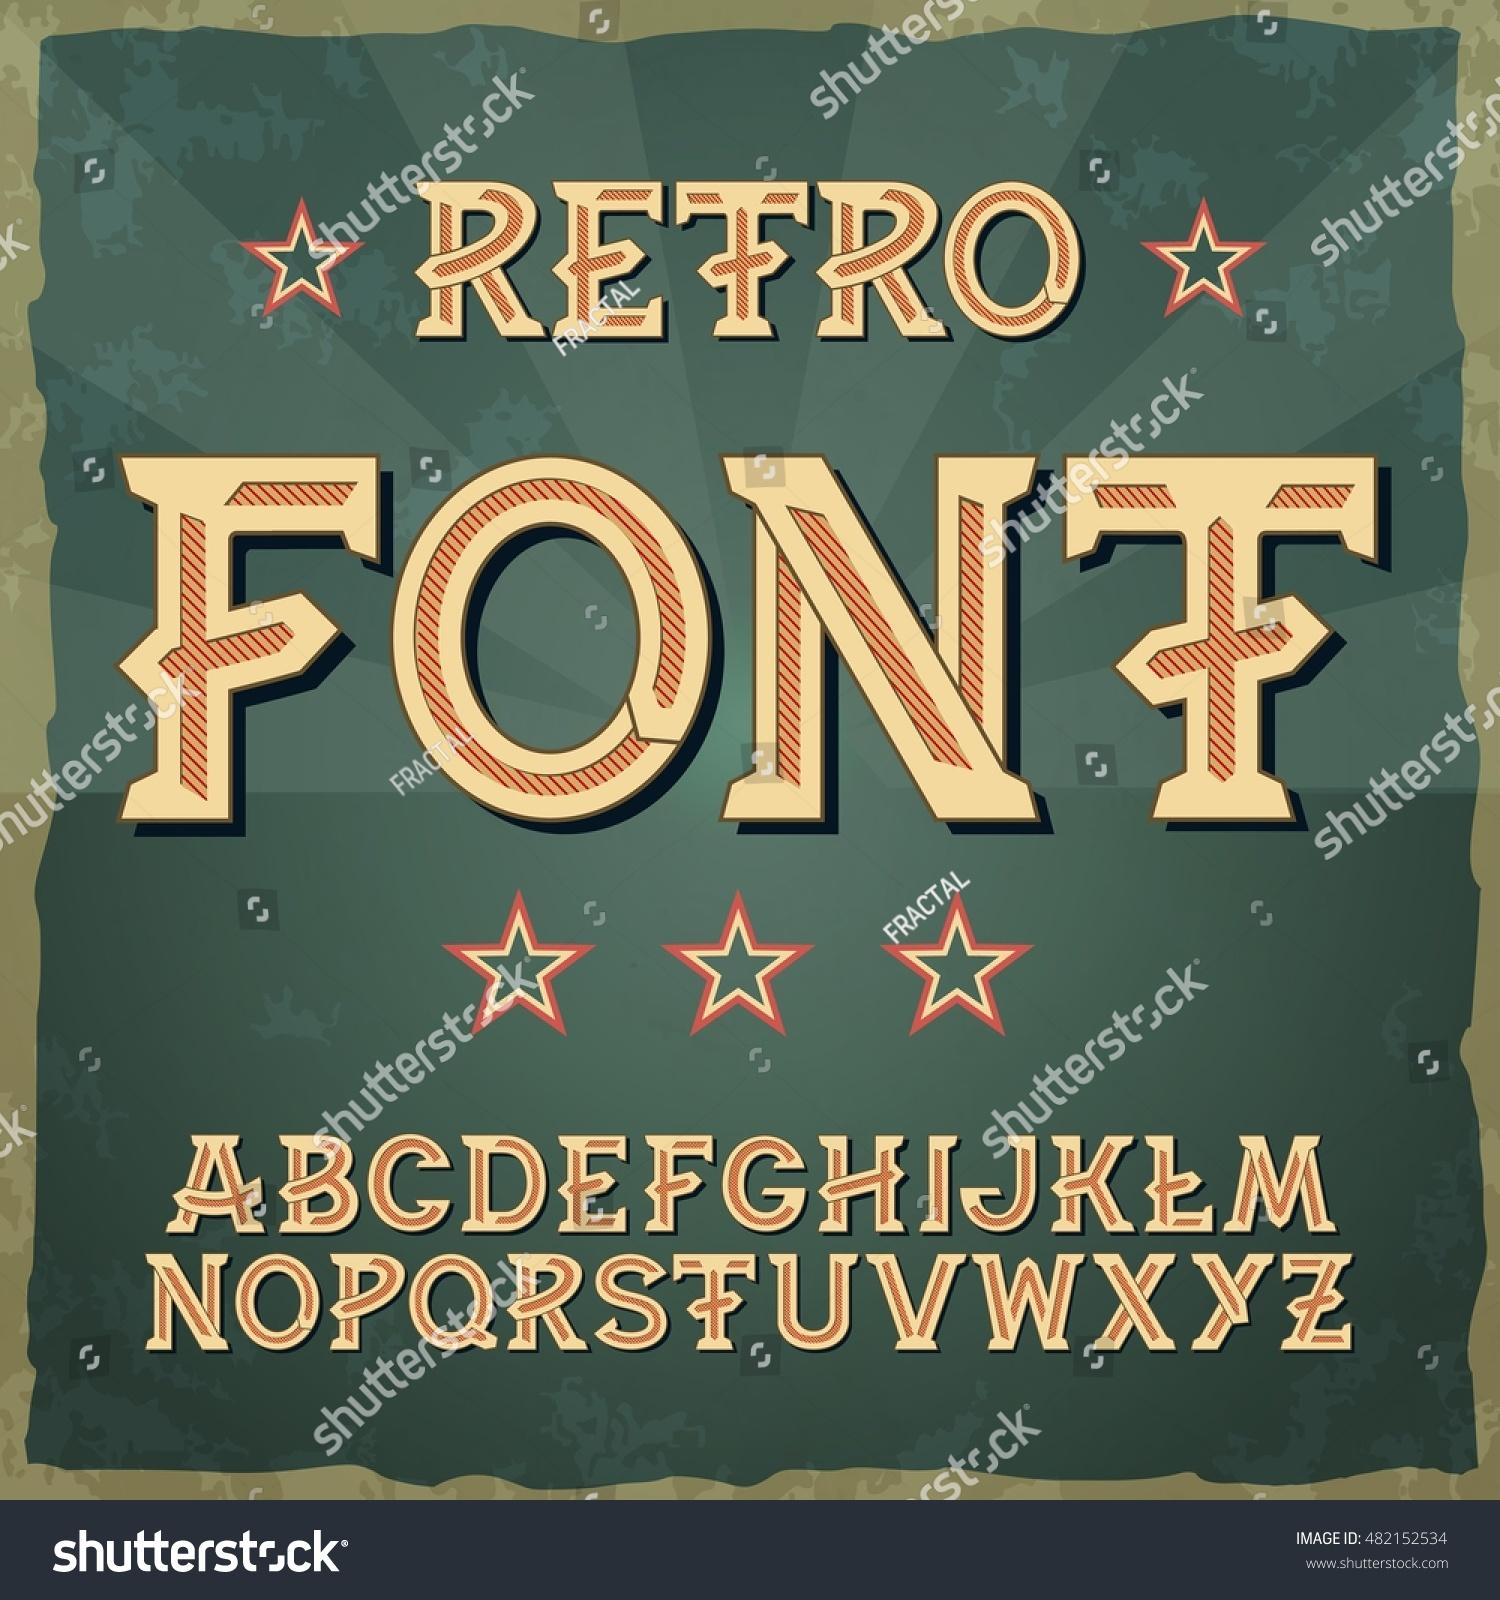 Retro military font 1945 retro type font vintage typography illustration eps10